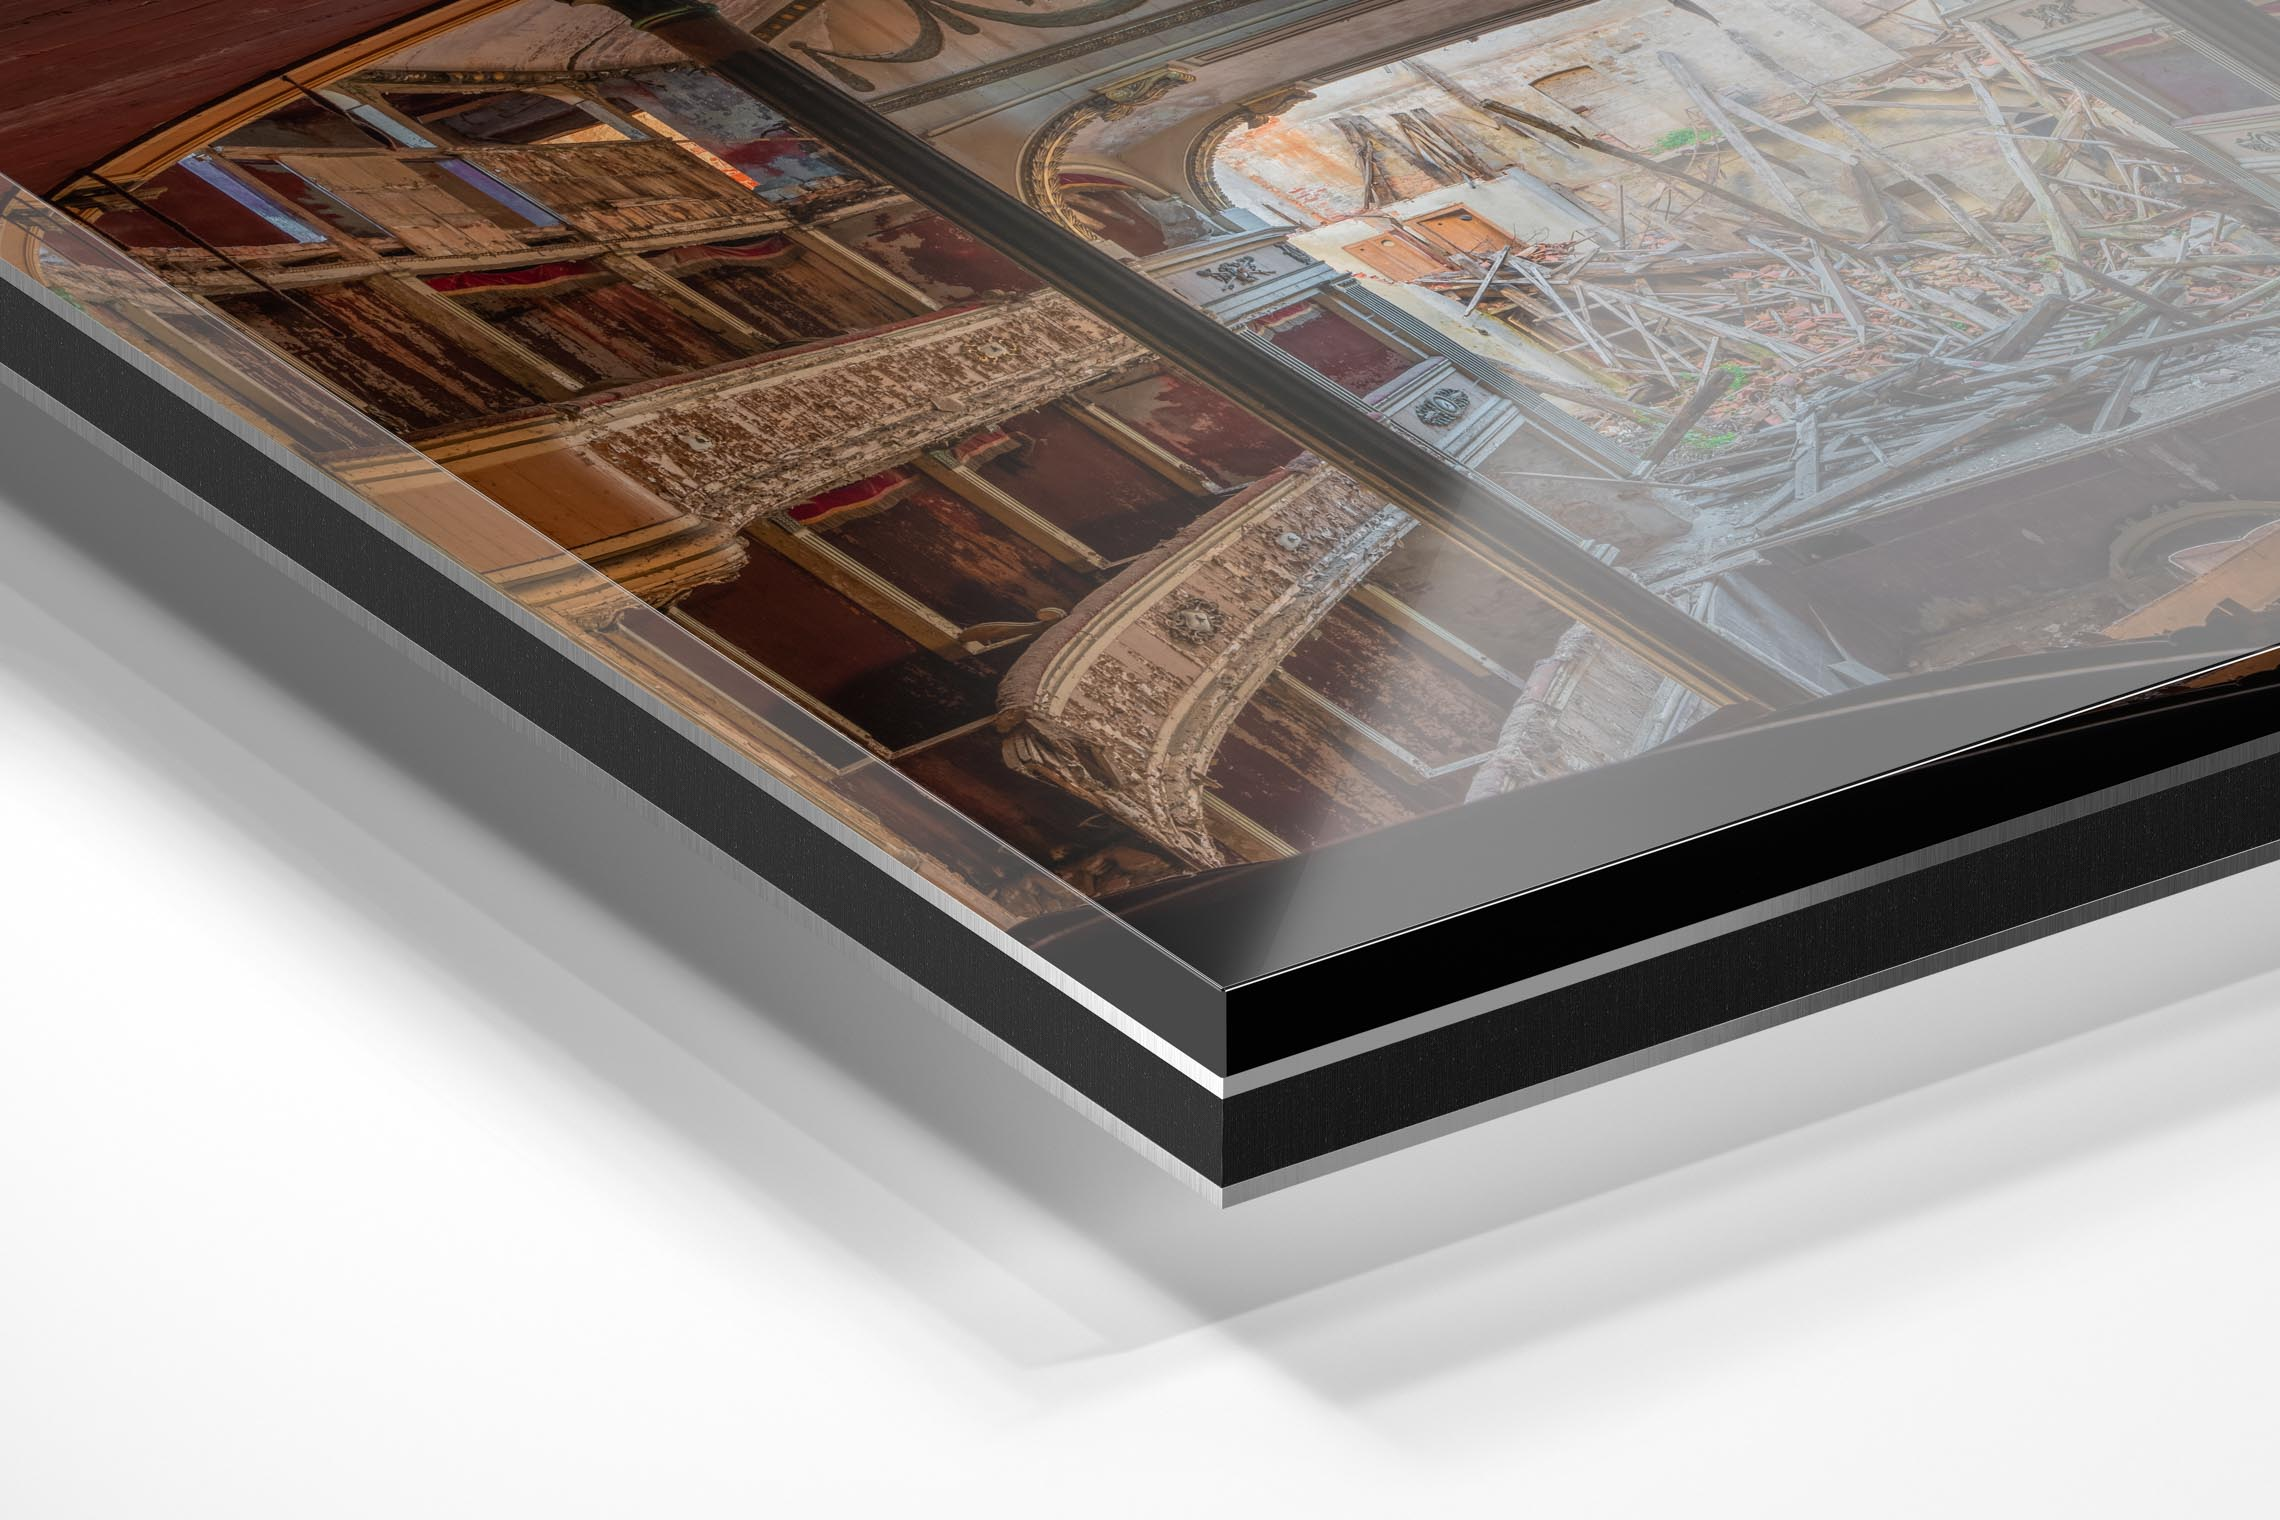 Baksteen Productions - wandecoratie - schilderij -fine art print - Aluminum dibond - clear epoxy_